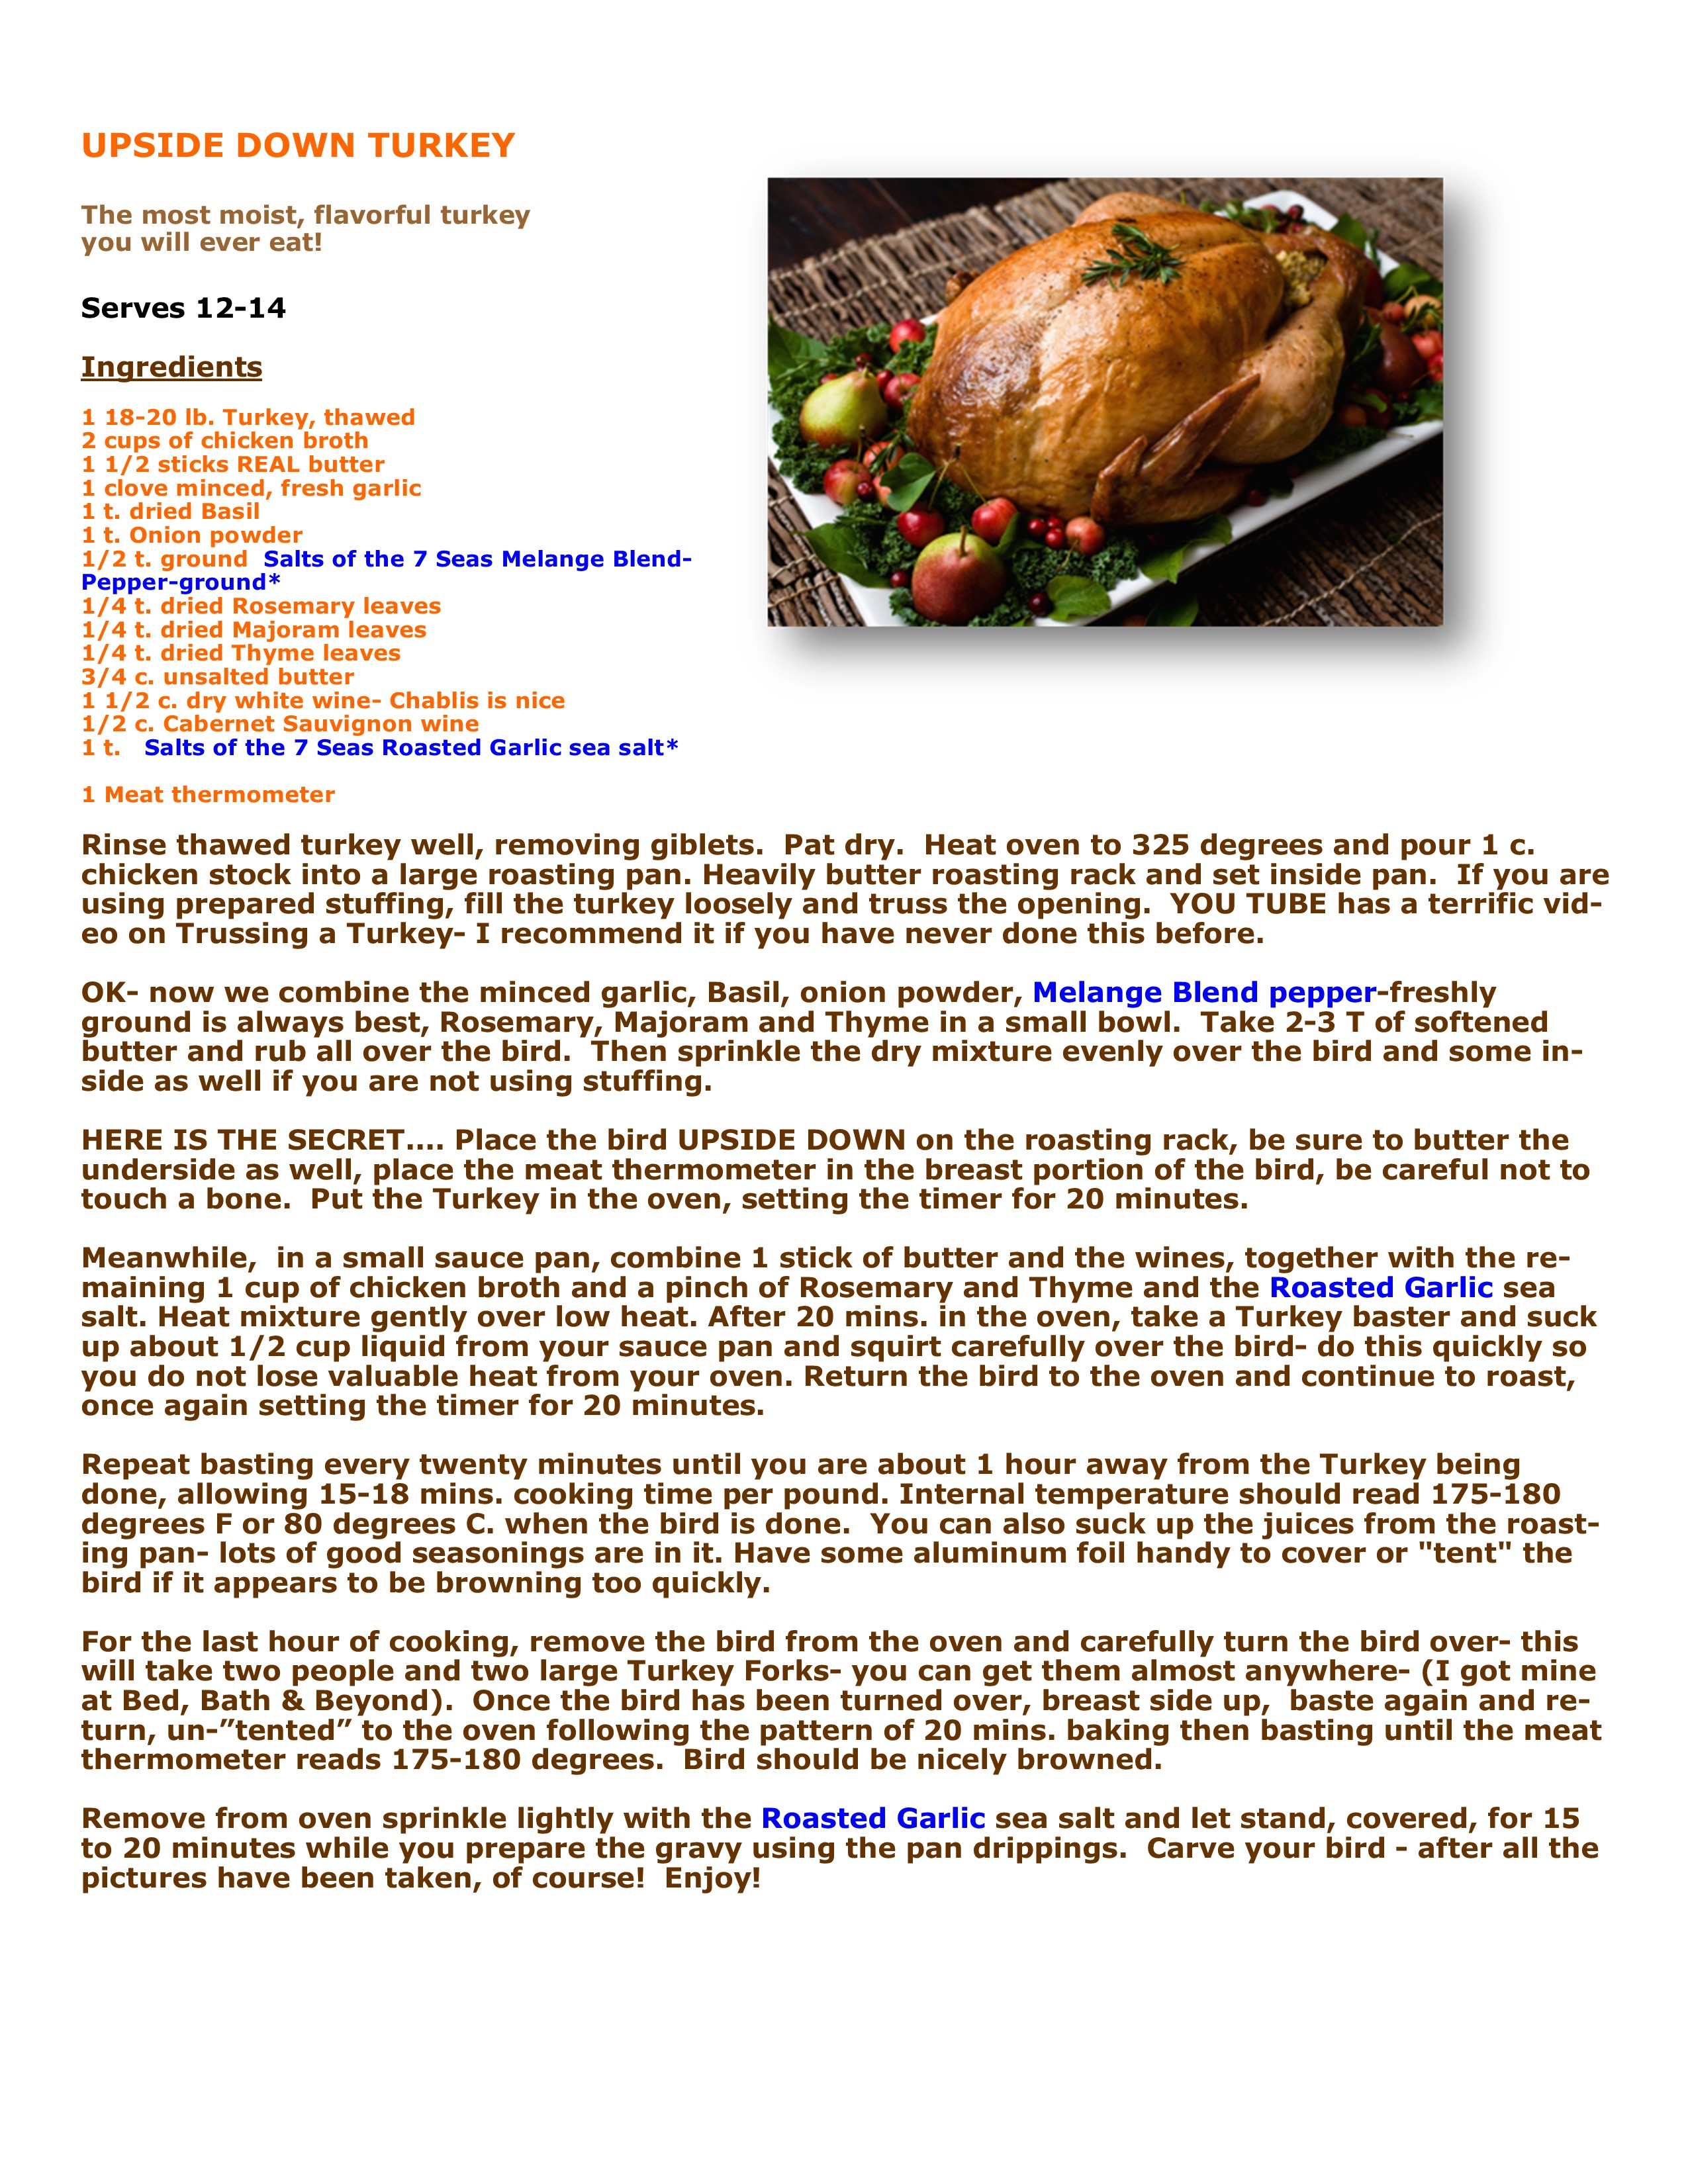 upside-down-turkey.jpg